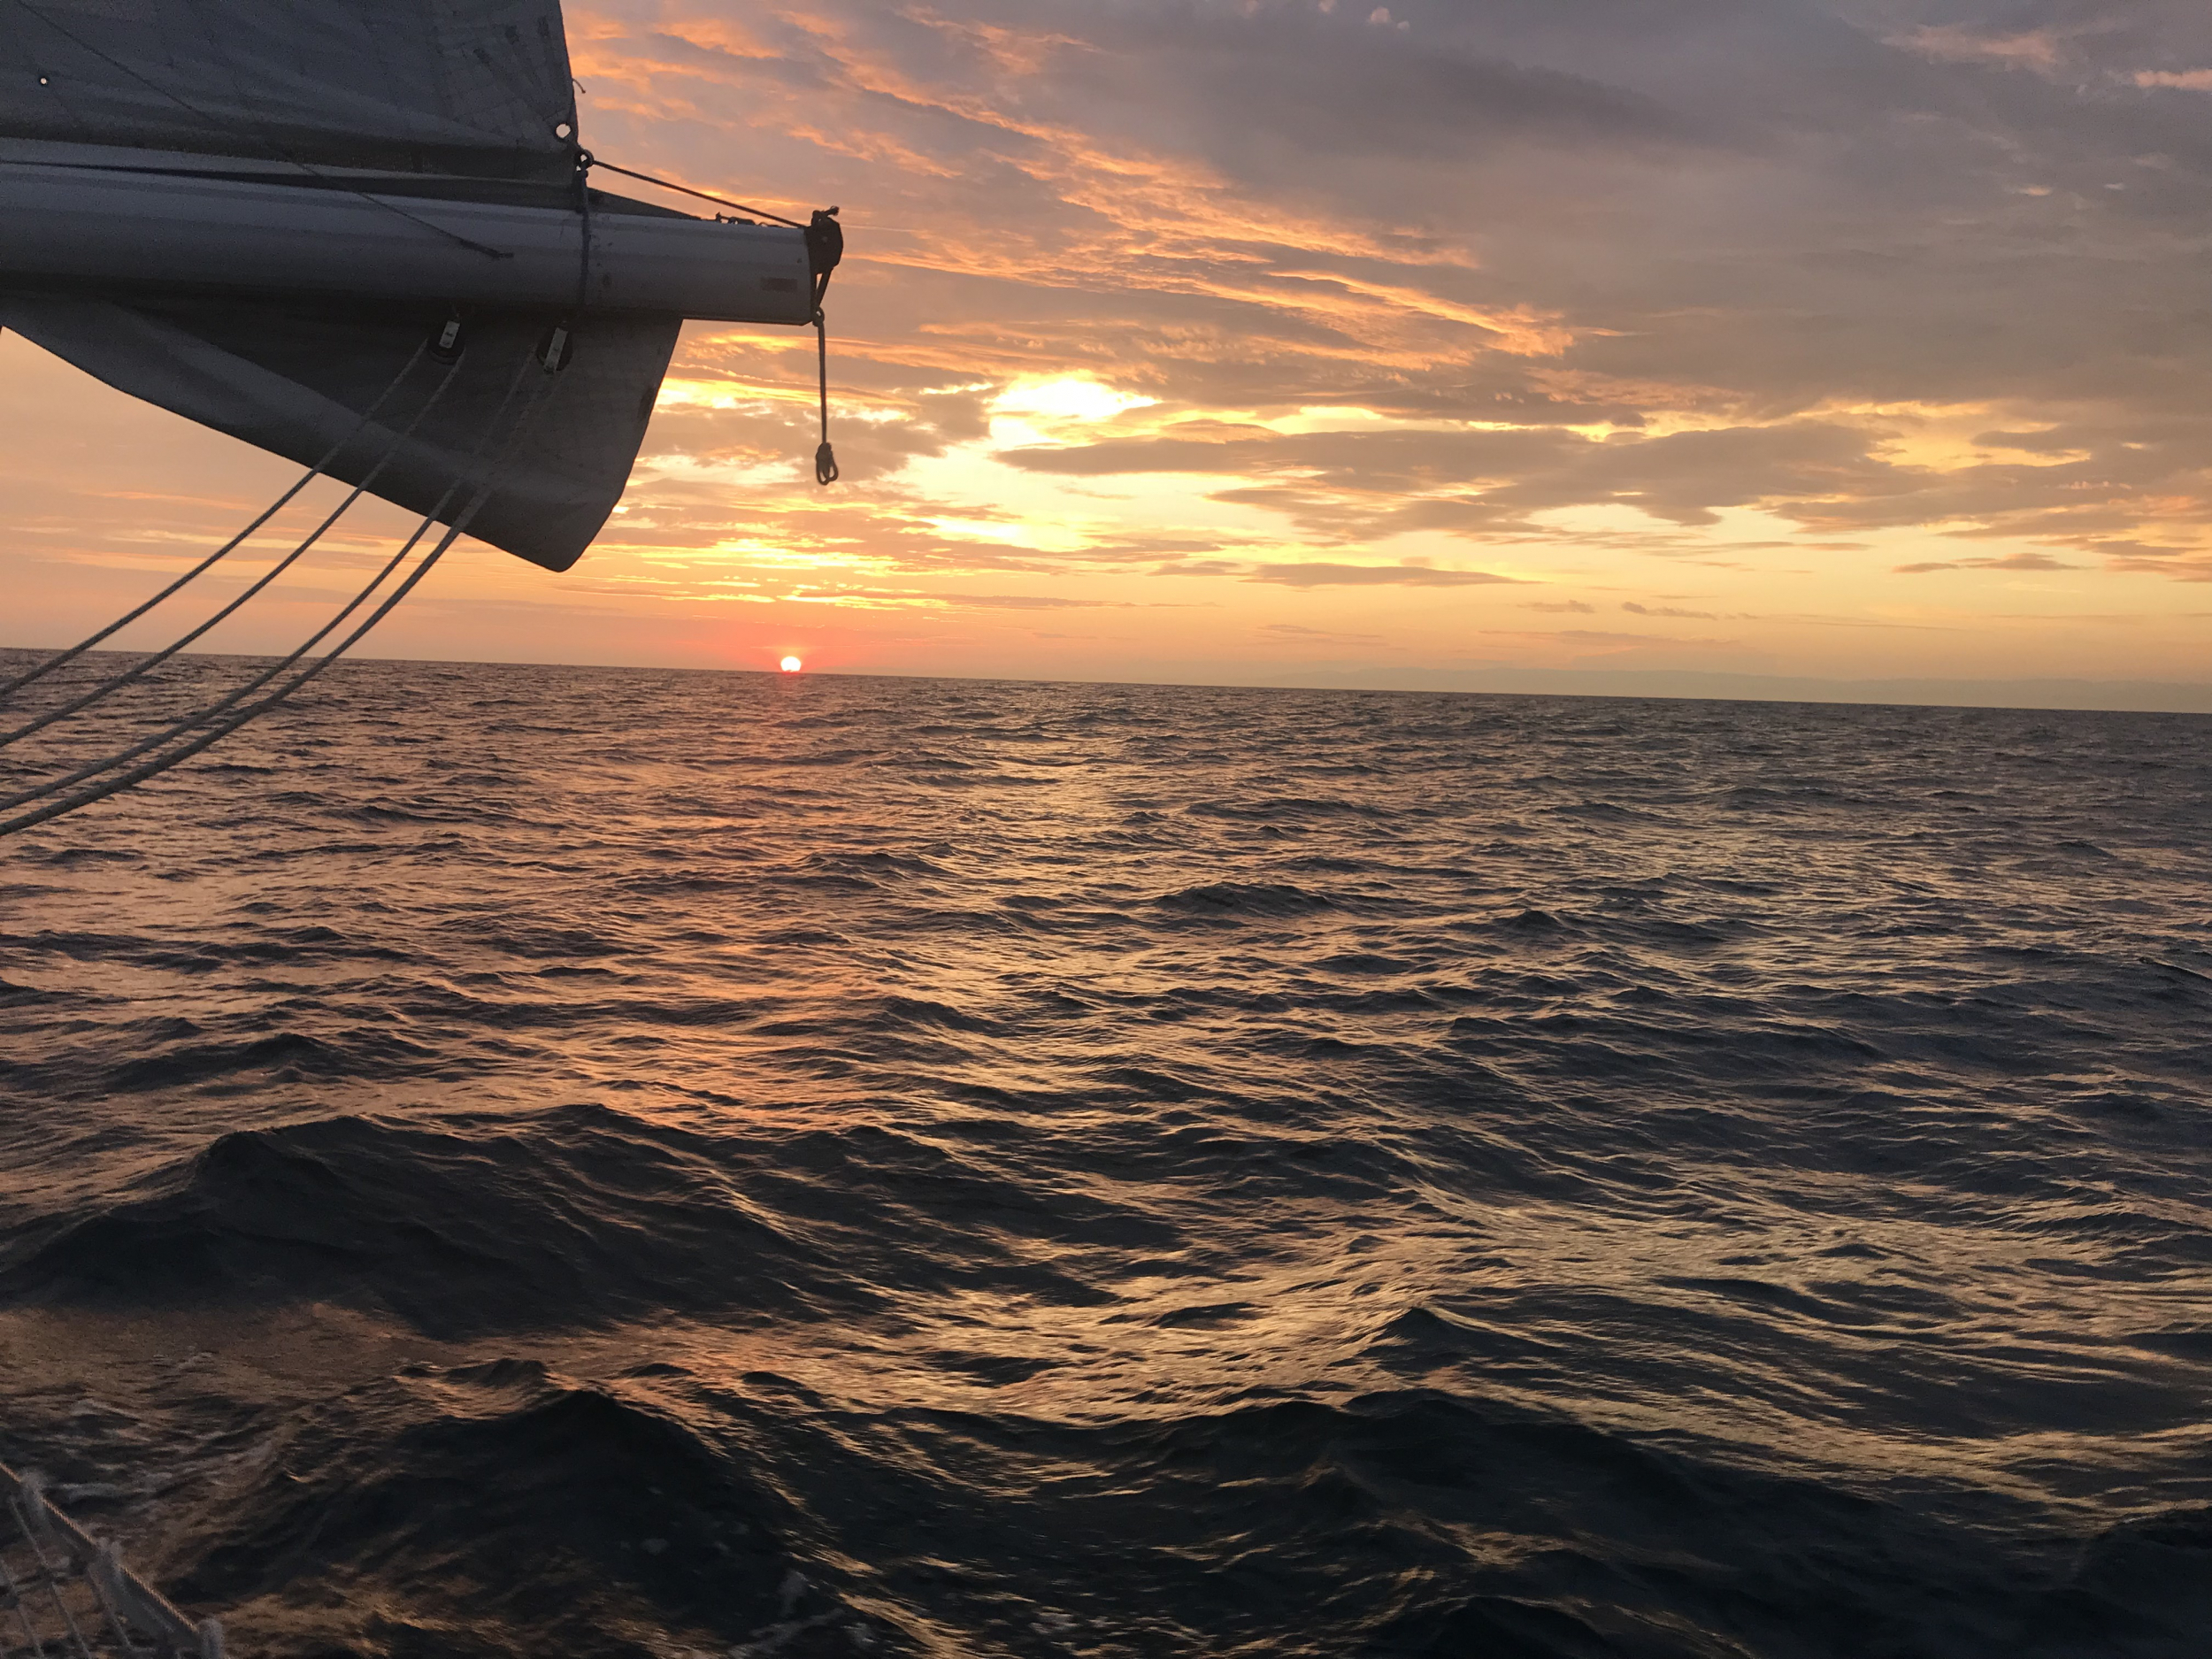 49. Sunset at sea